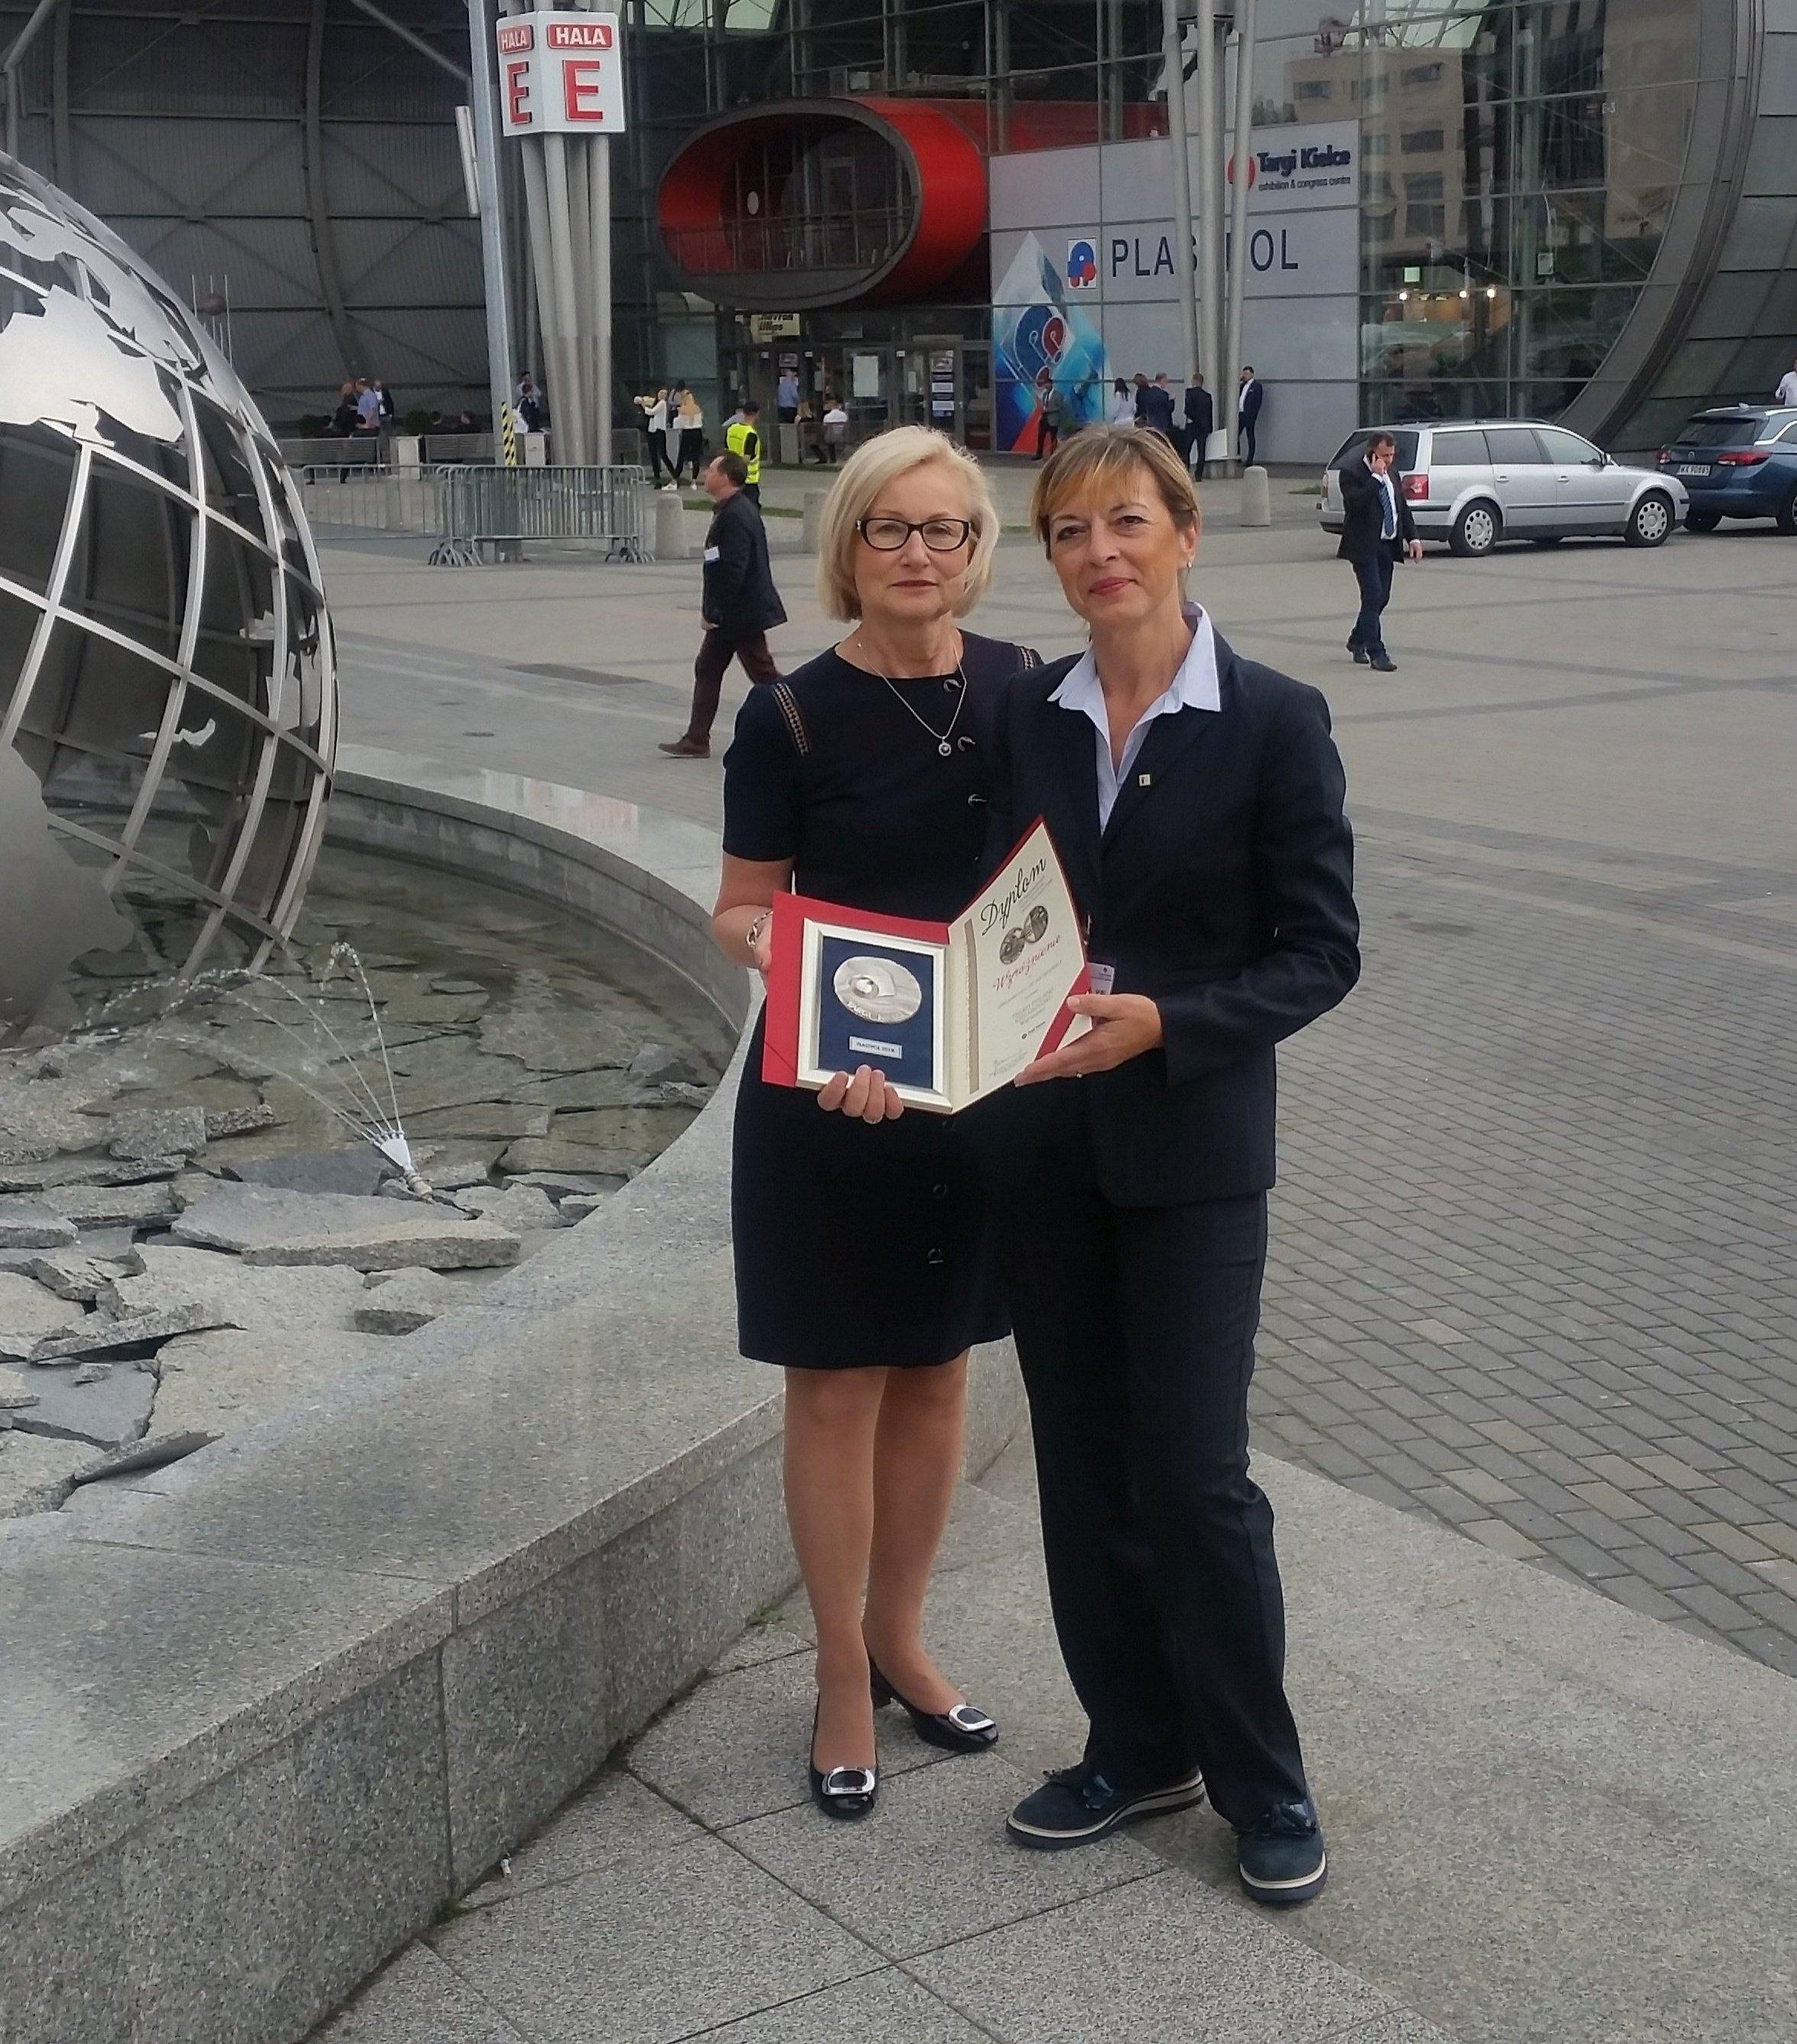 Plastpol Telko Poland 2018 winners-624673-edited-702366-edited